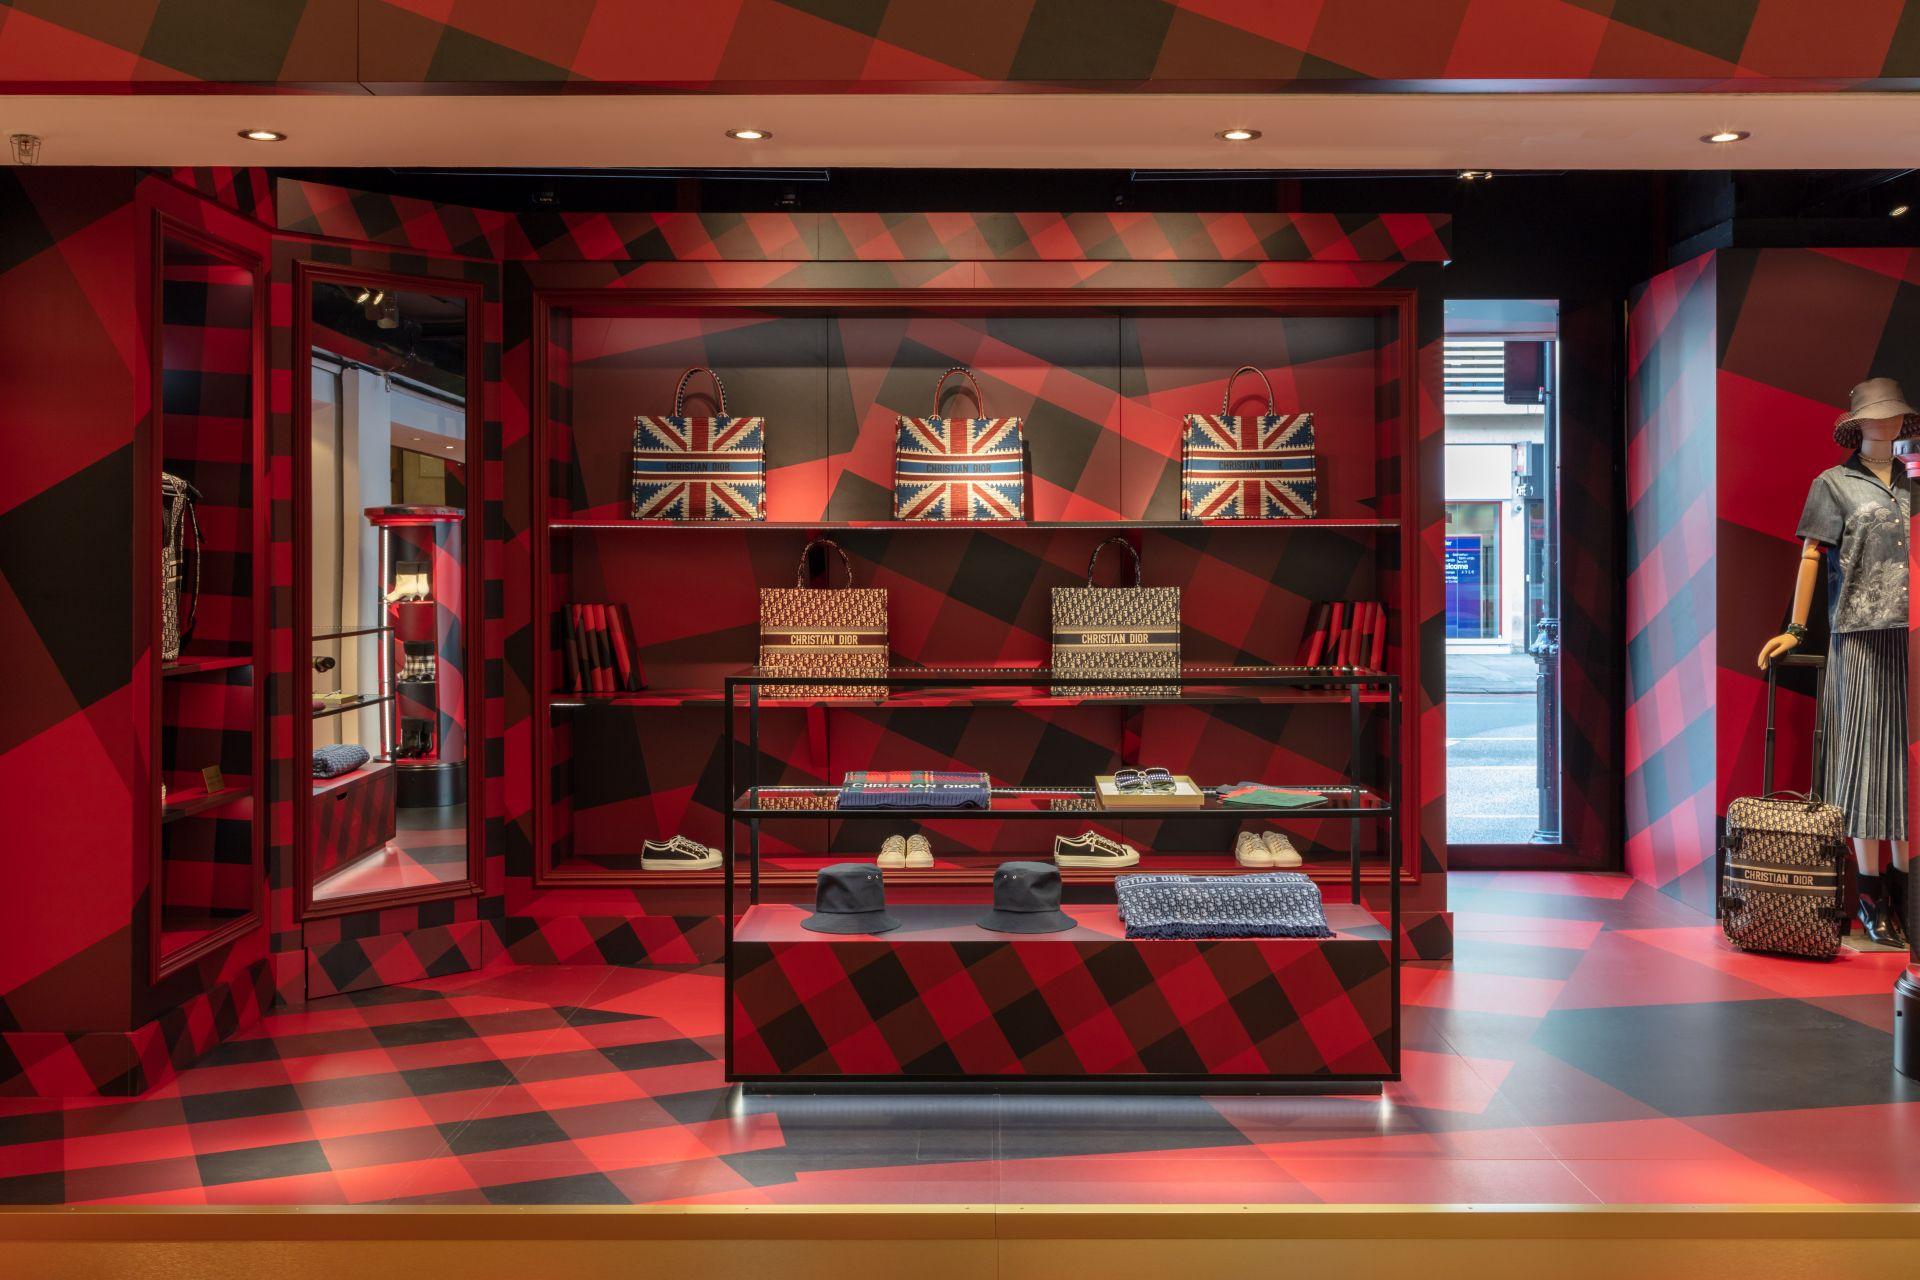 Dior's Got A Pop-Up Boutique At Harrods Until August 31